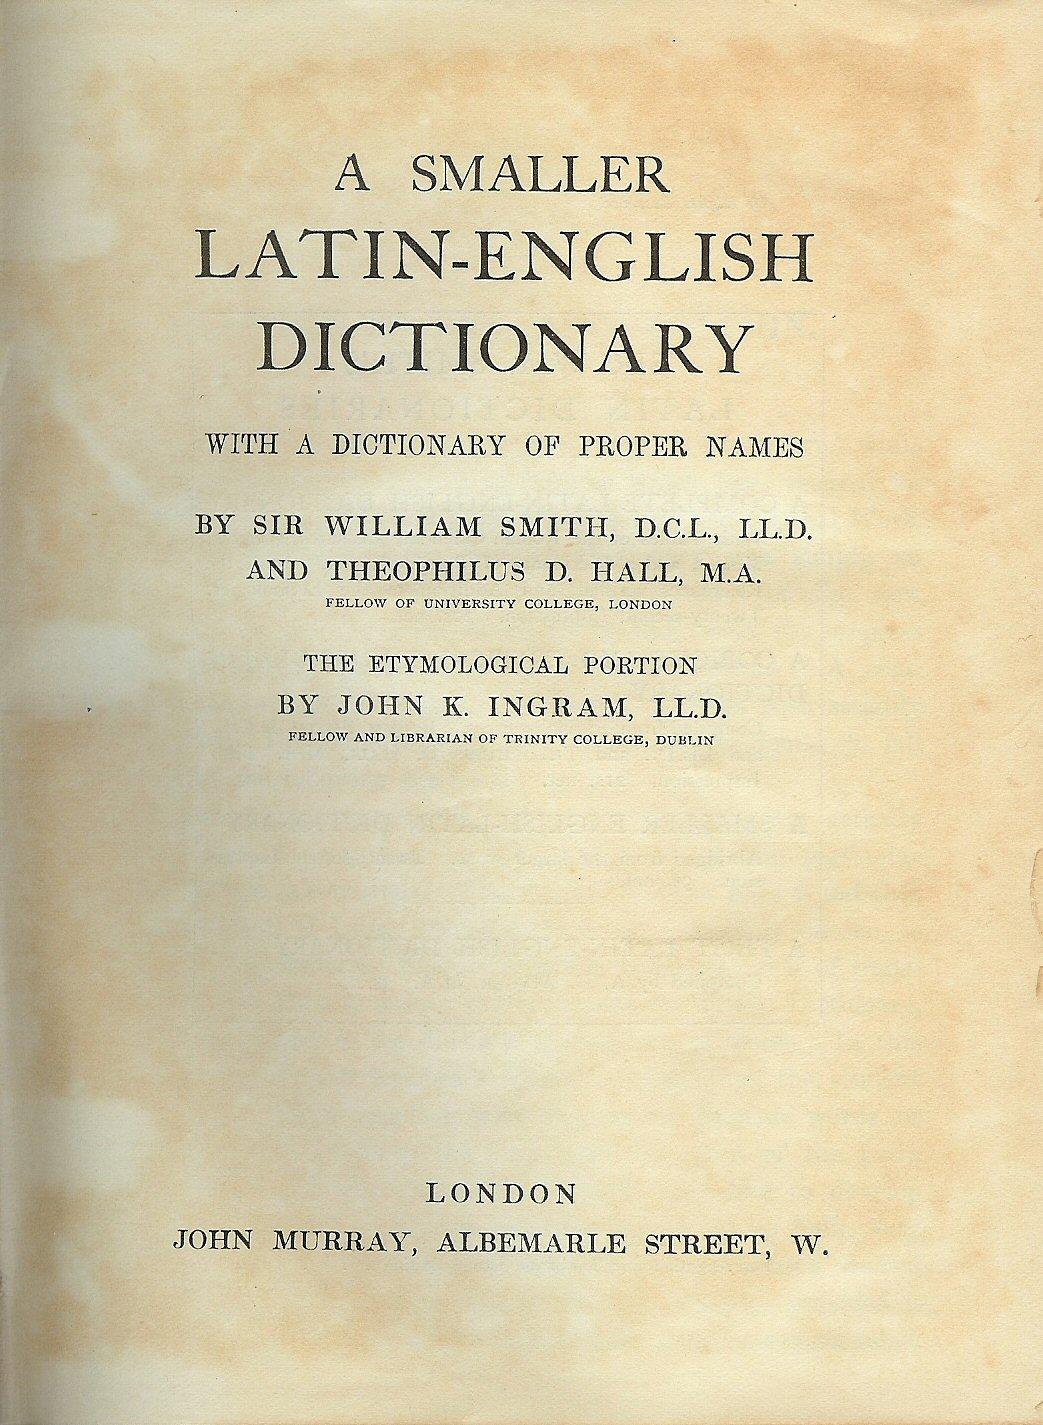 Ref01_Latin_Dictionary_Title.jpg